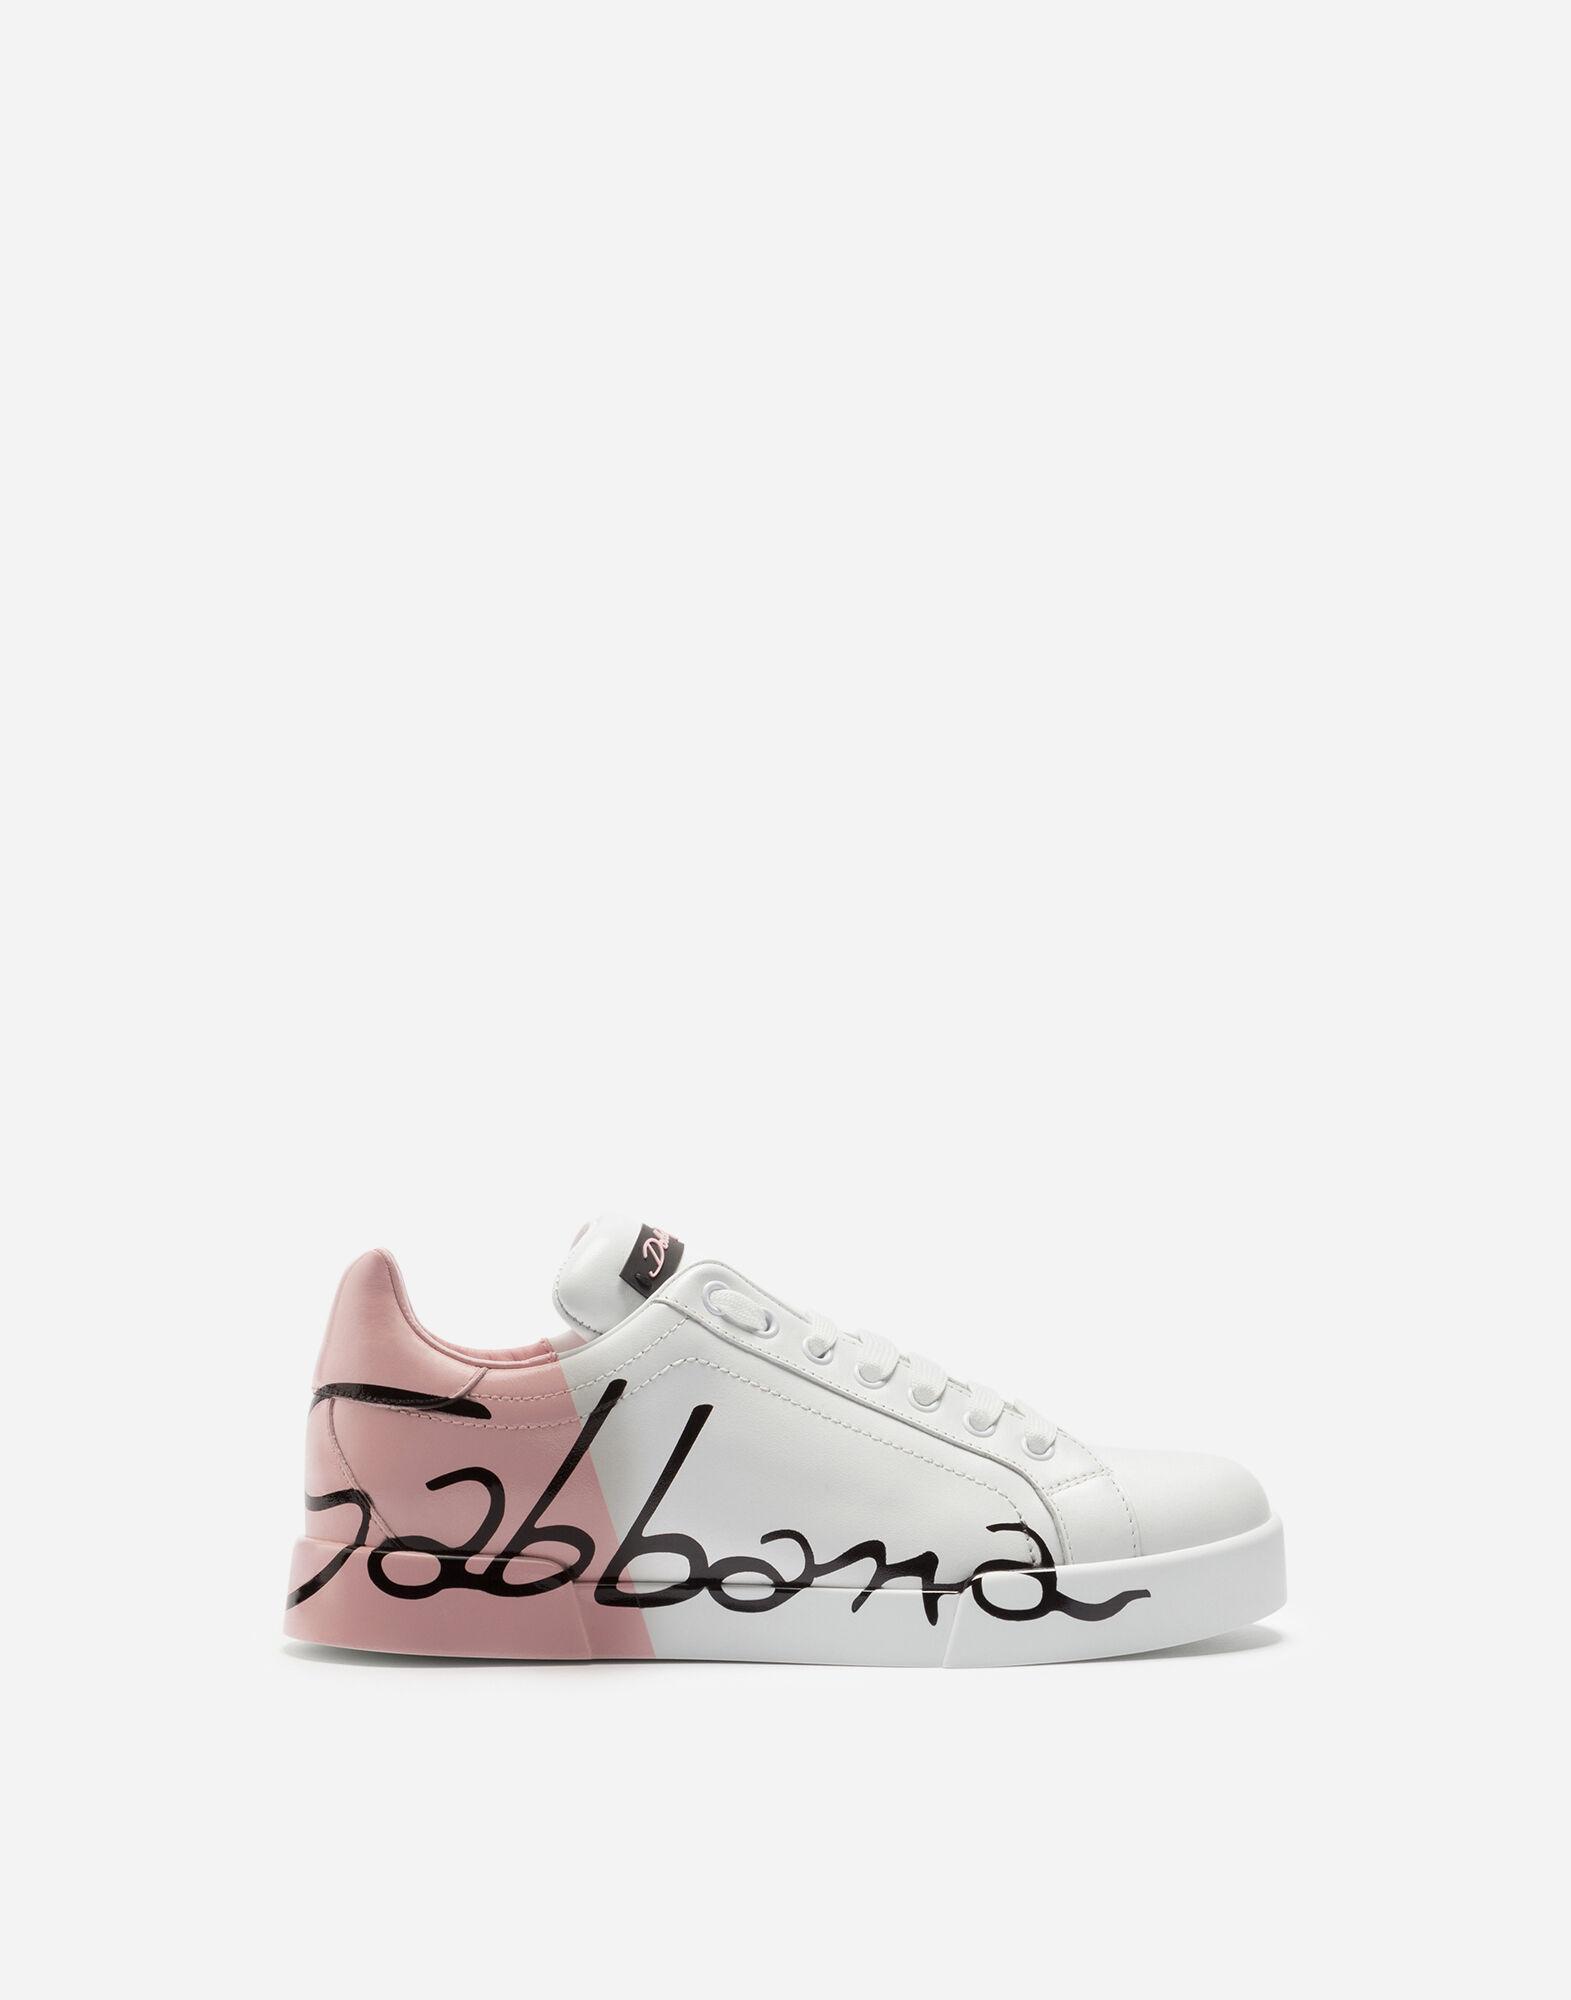 dolce & gabbana pink shoes